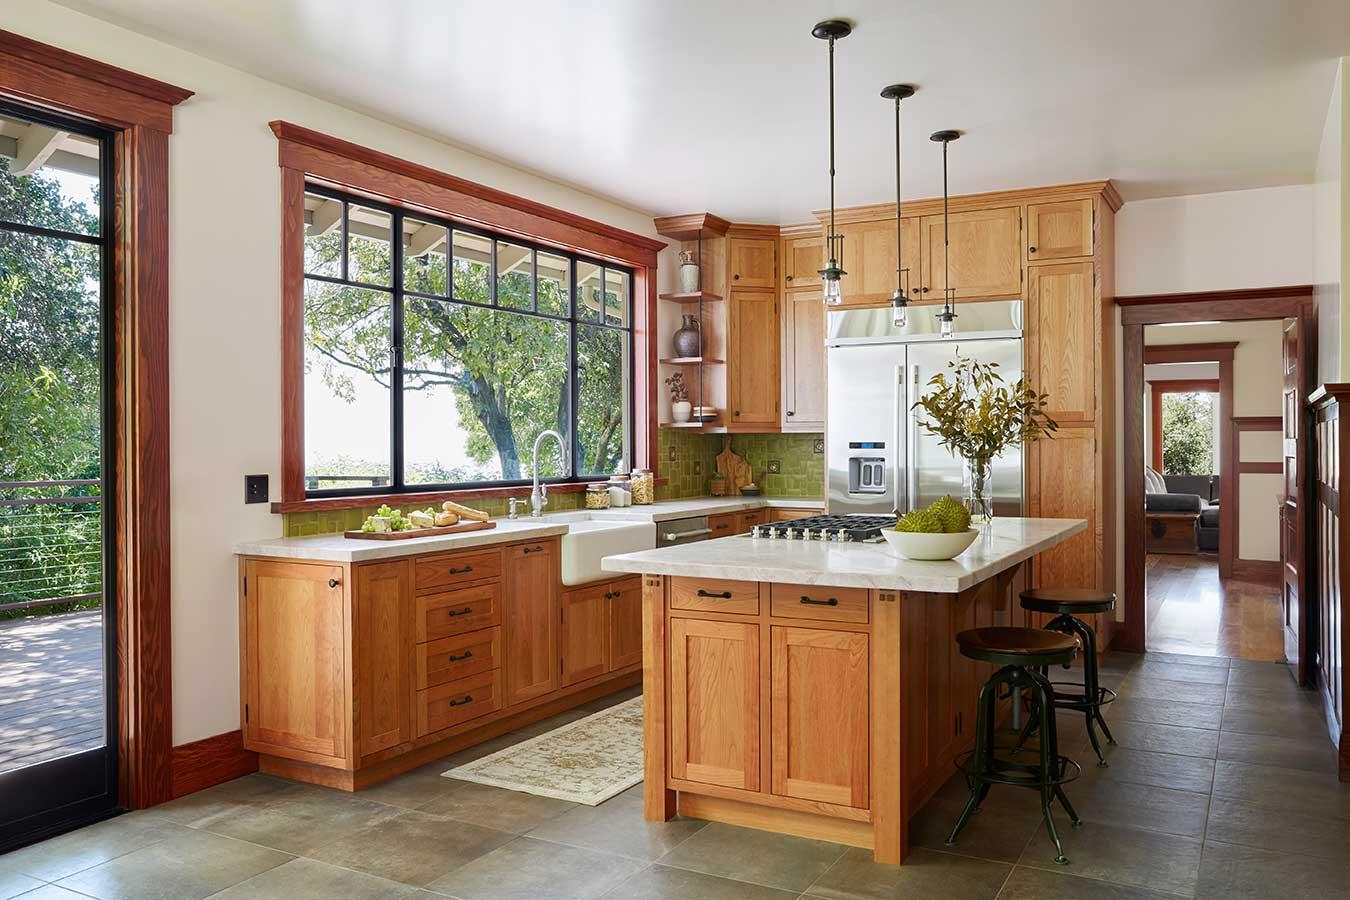 Project Spotlight – 1912 Craftsman Style Home Undergoes Major Renovation